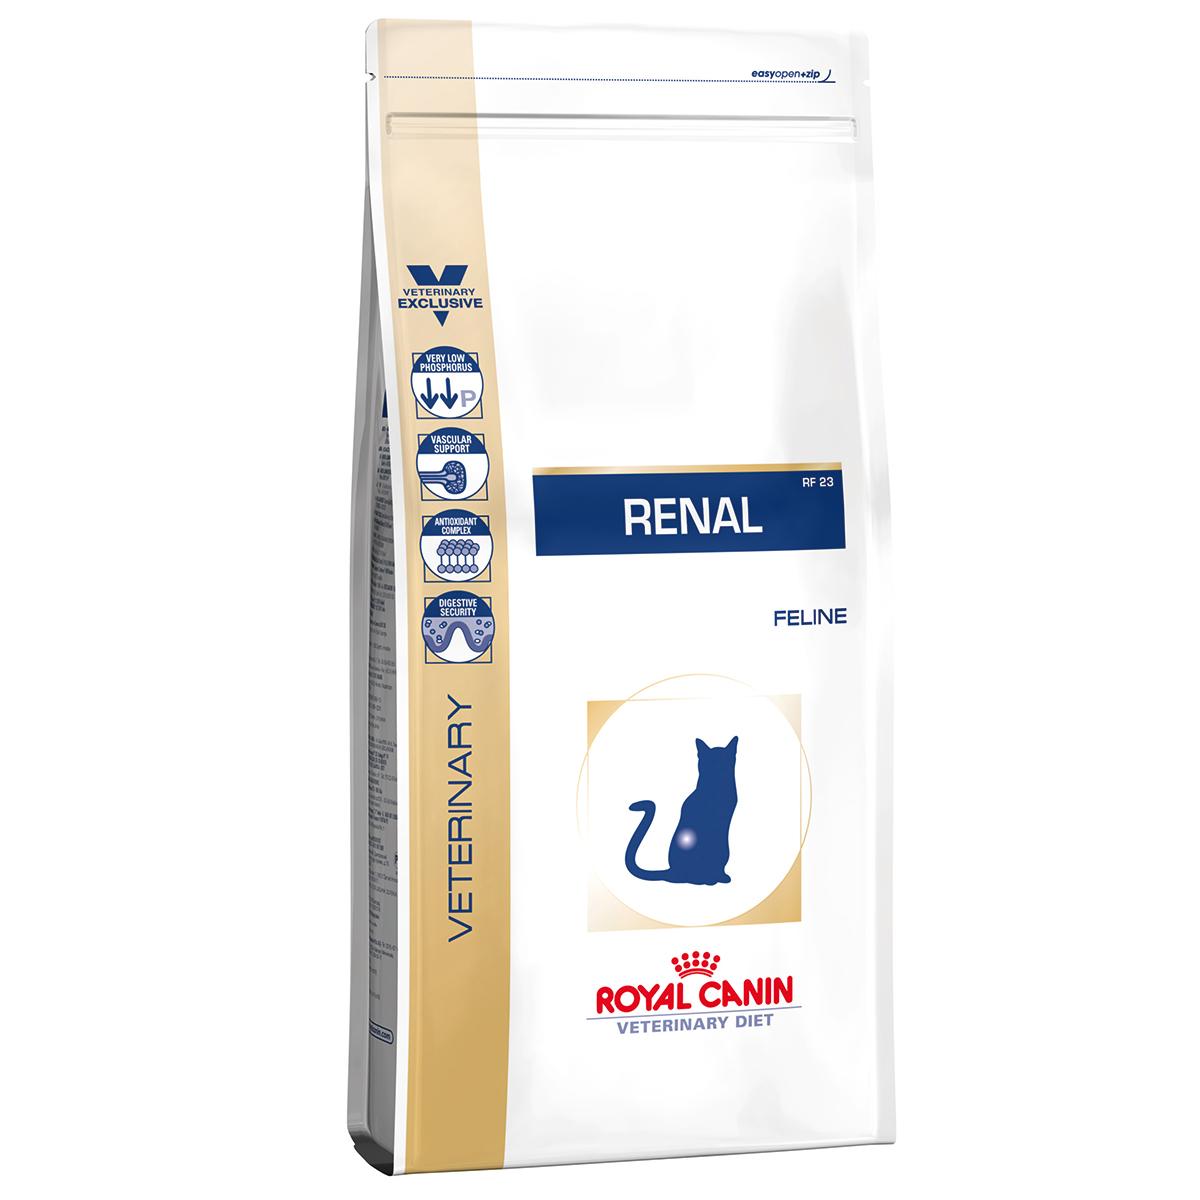 Royal Canin Renal Cat 4 Kg imagine